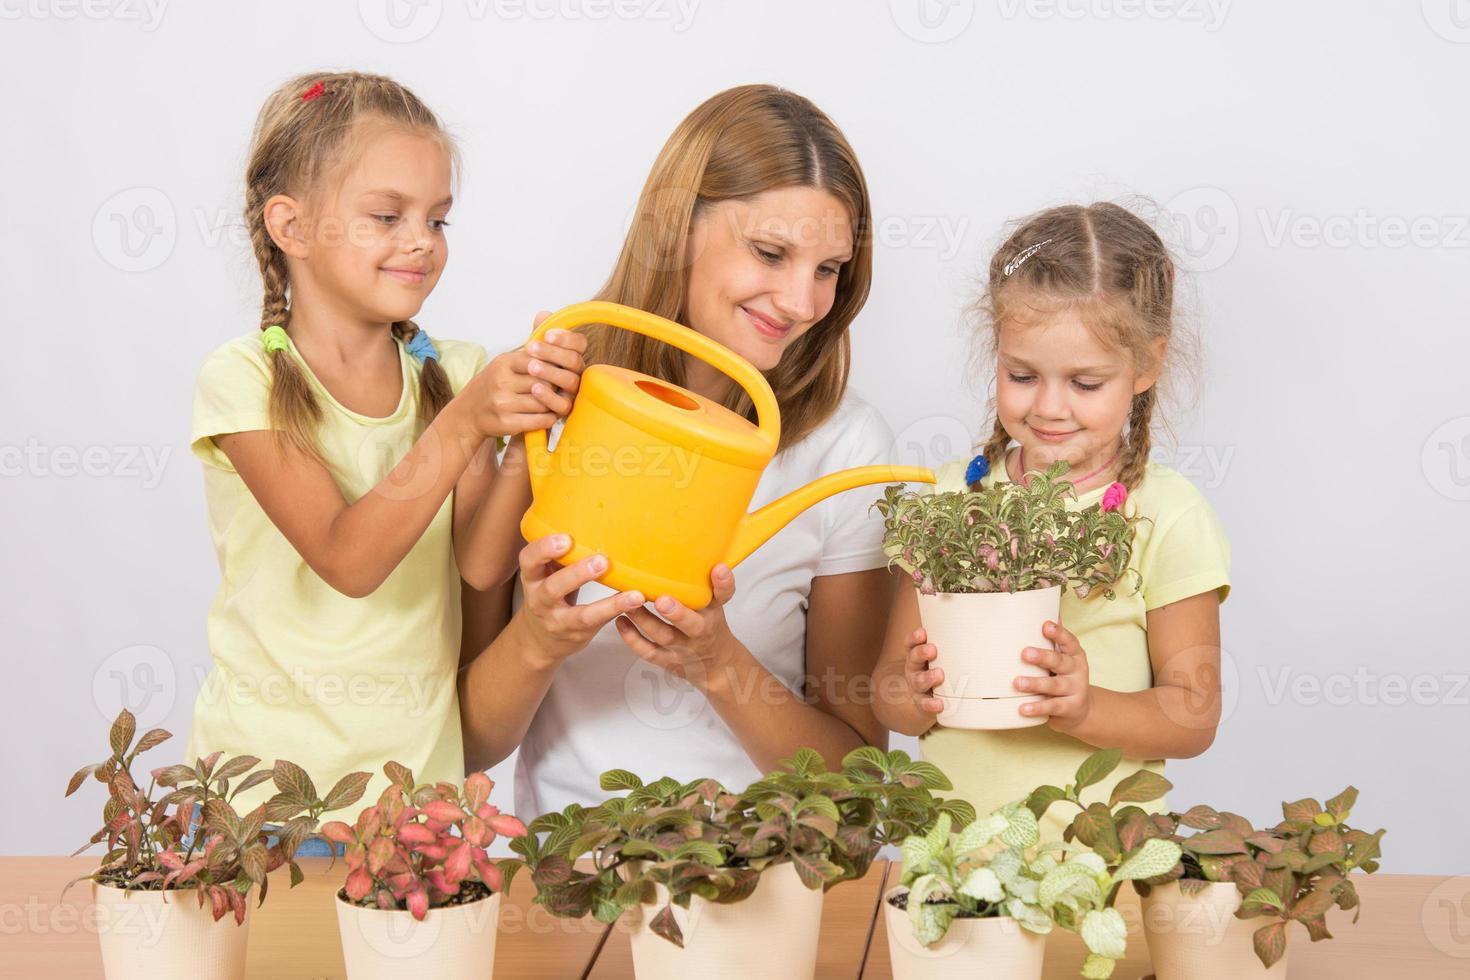 madre e hijos felices regando flores foto